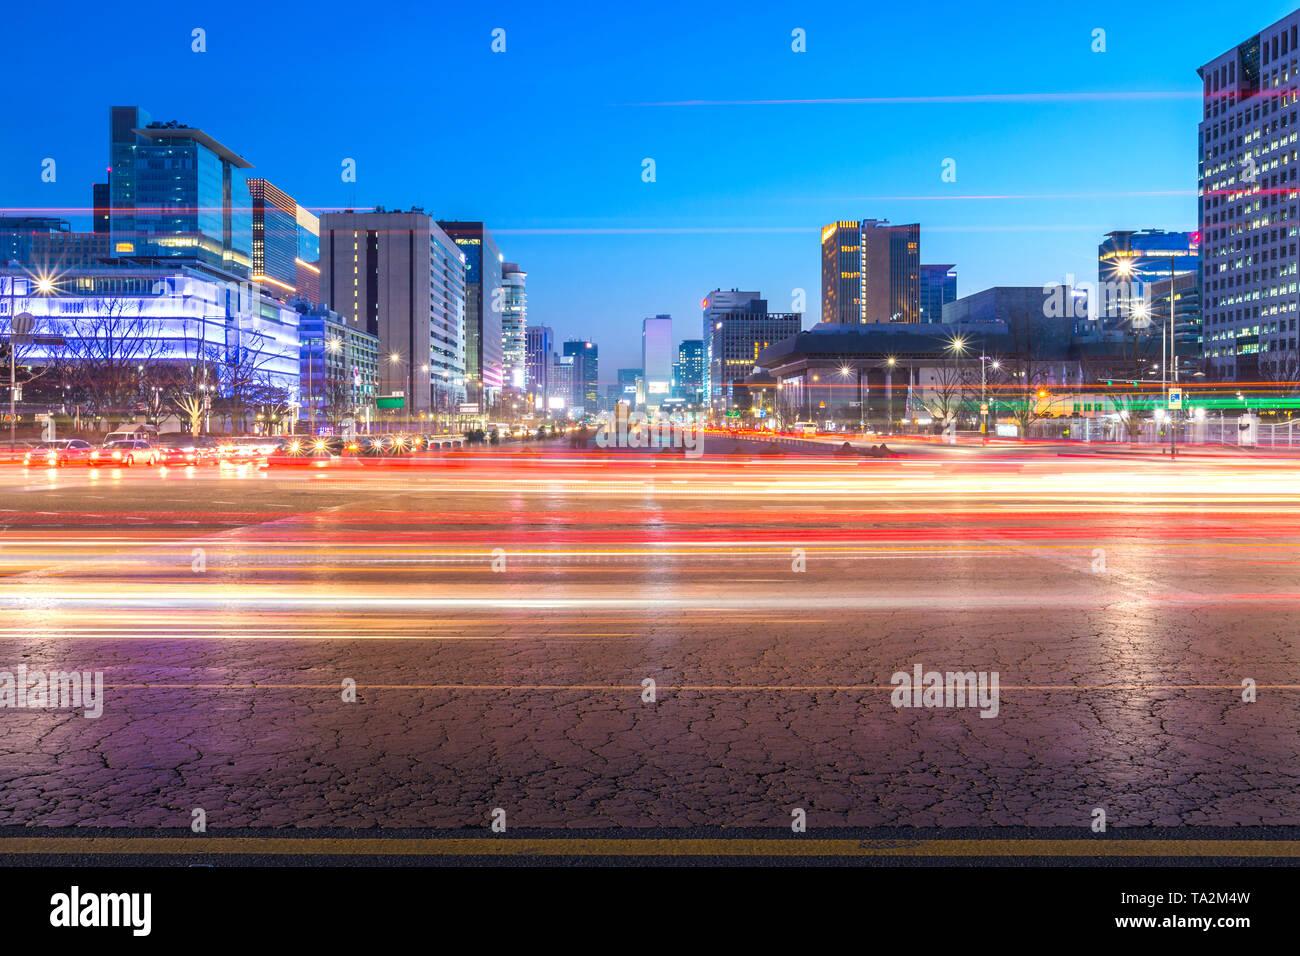 SEOUL, KOREA - February 10, 2016: Seoul Cityscape in downtown and skyscraper , South Korea. - Stock Image